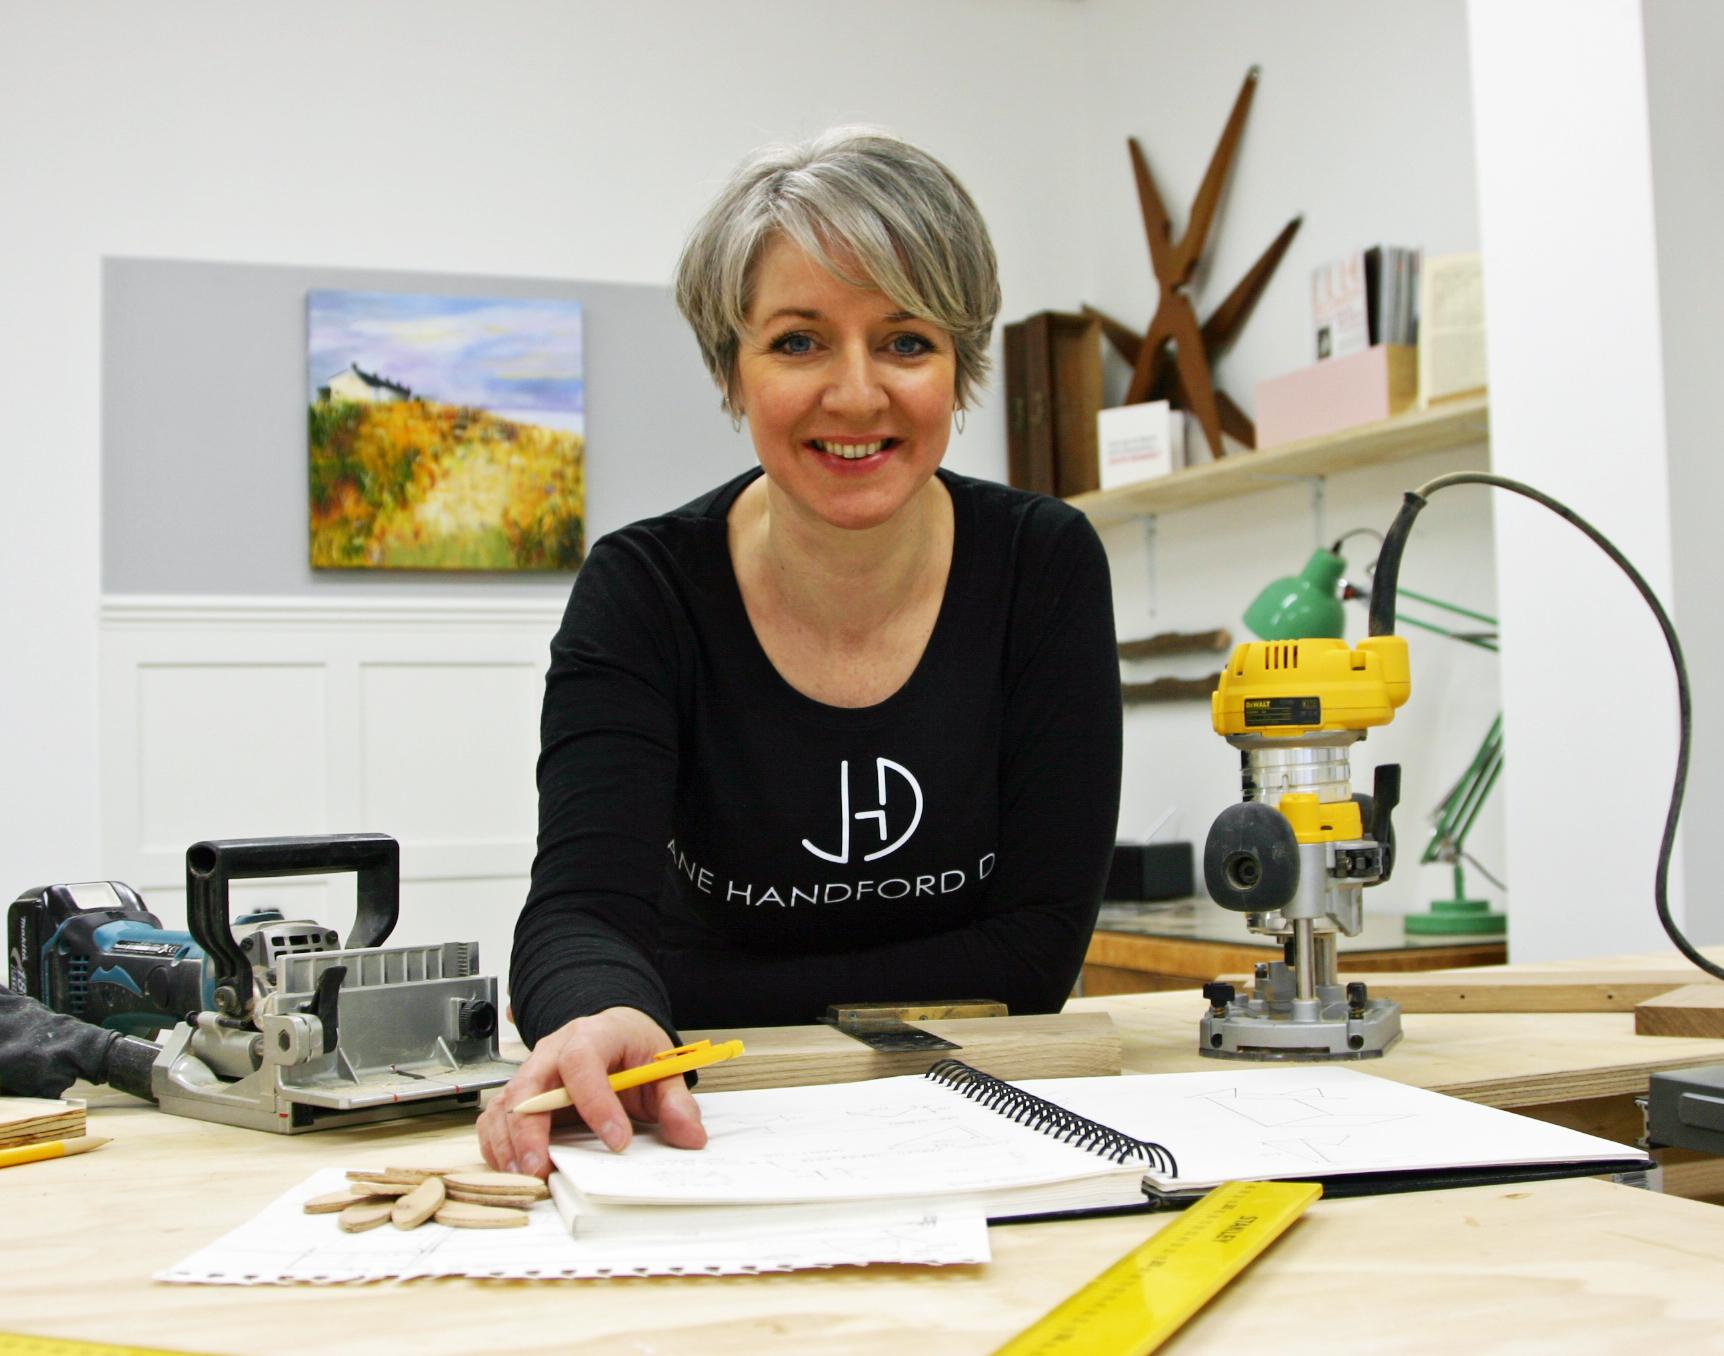 Jane Handford